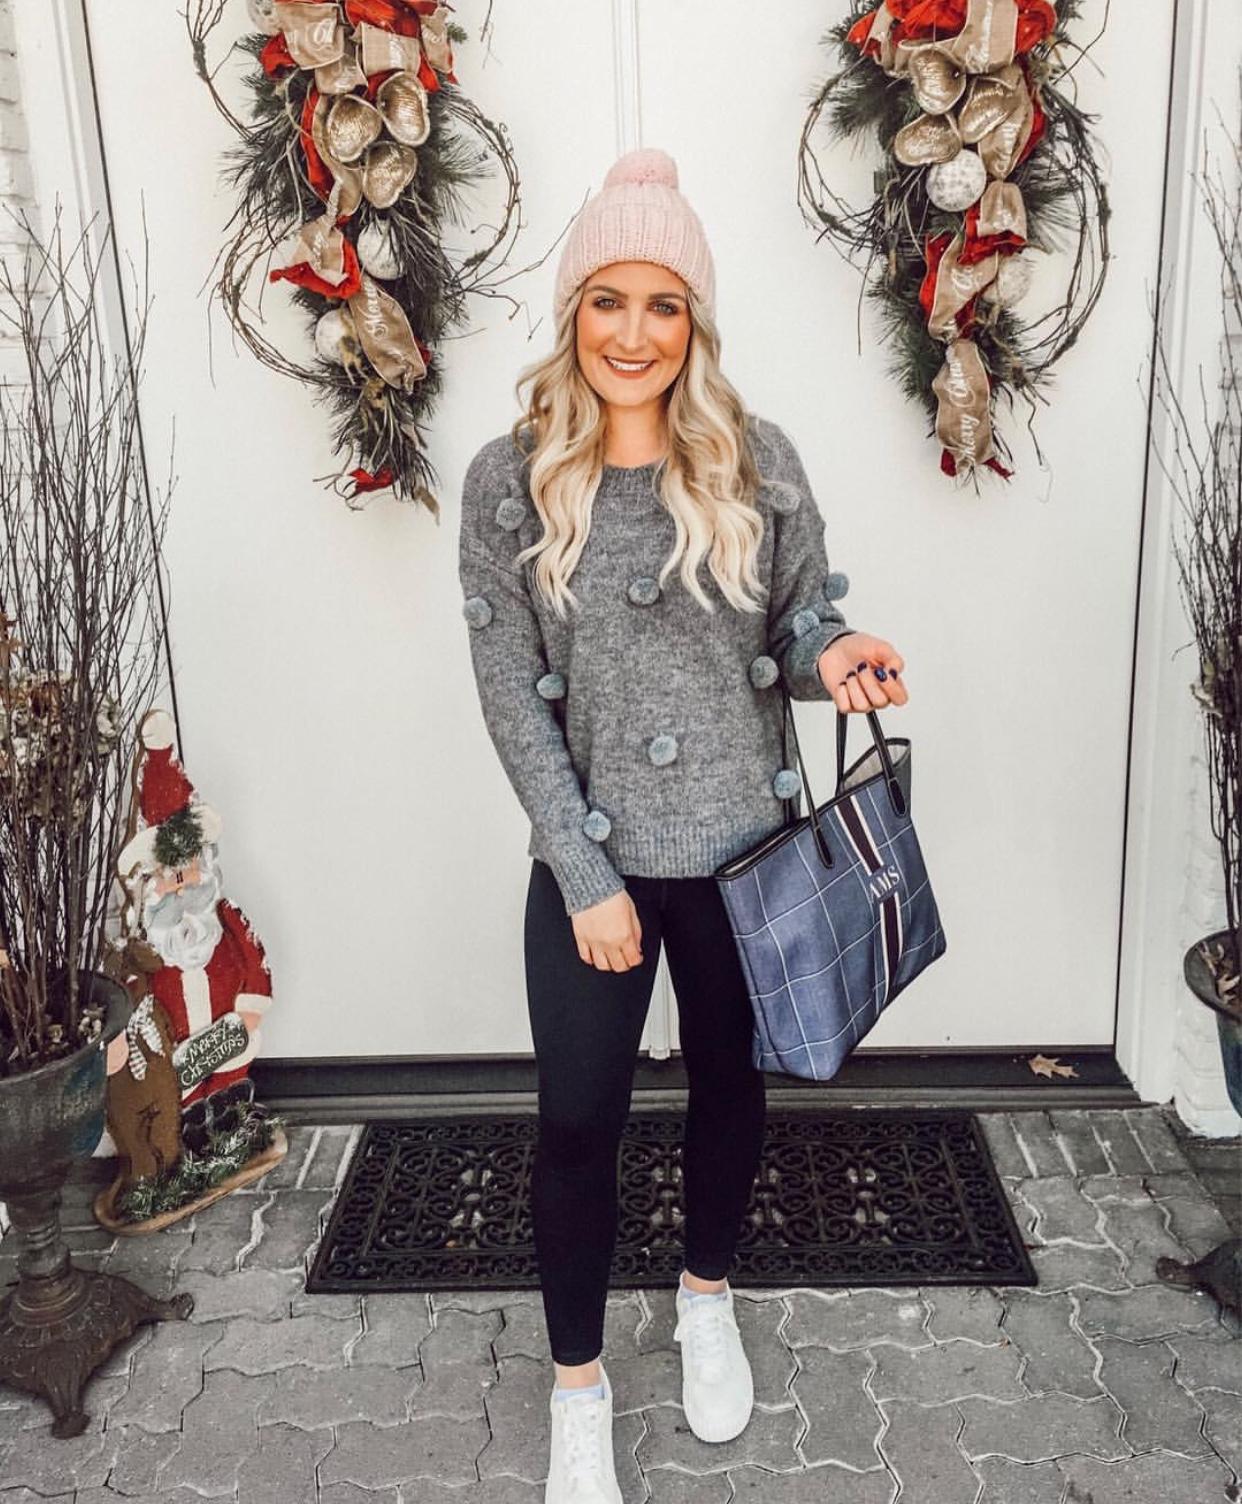 boohoo pom pom sweater | Winter Fashion | Audrey Madison Stowe a fashion and lifestyle blogger